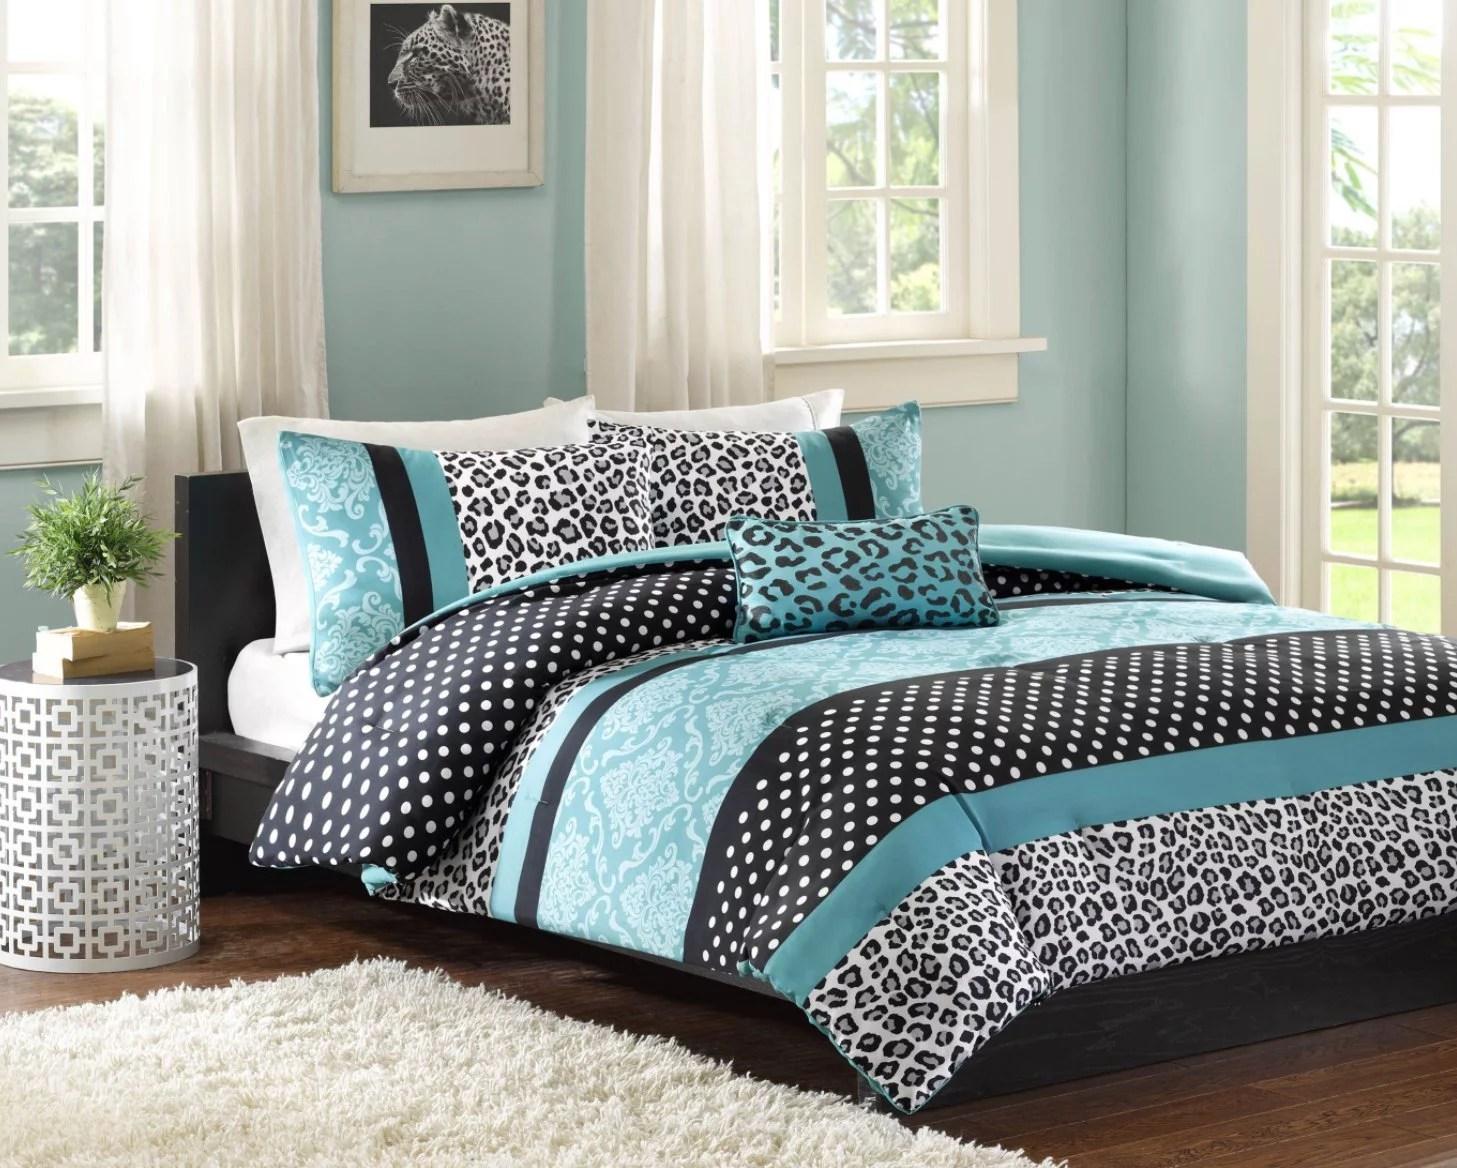 Comforter Bed Set Teen Bedding Modern Teal Black Animal ... on Teenage Bed  id=17294